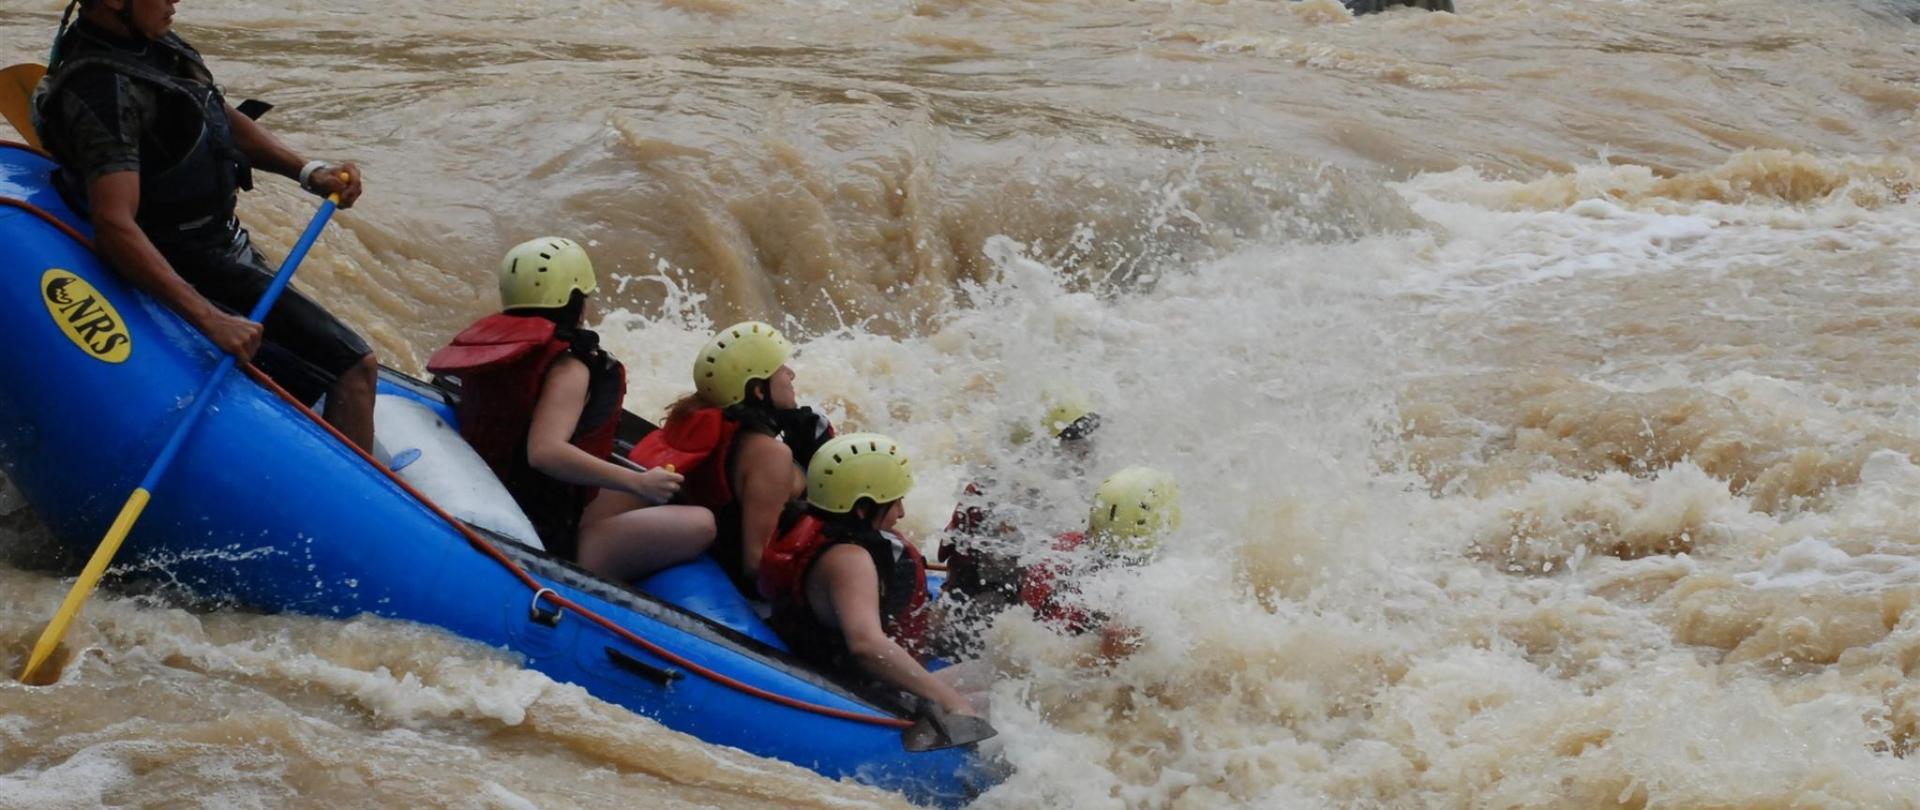 whitewater-rafting-300-dpi.jpg